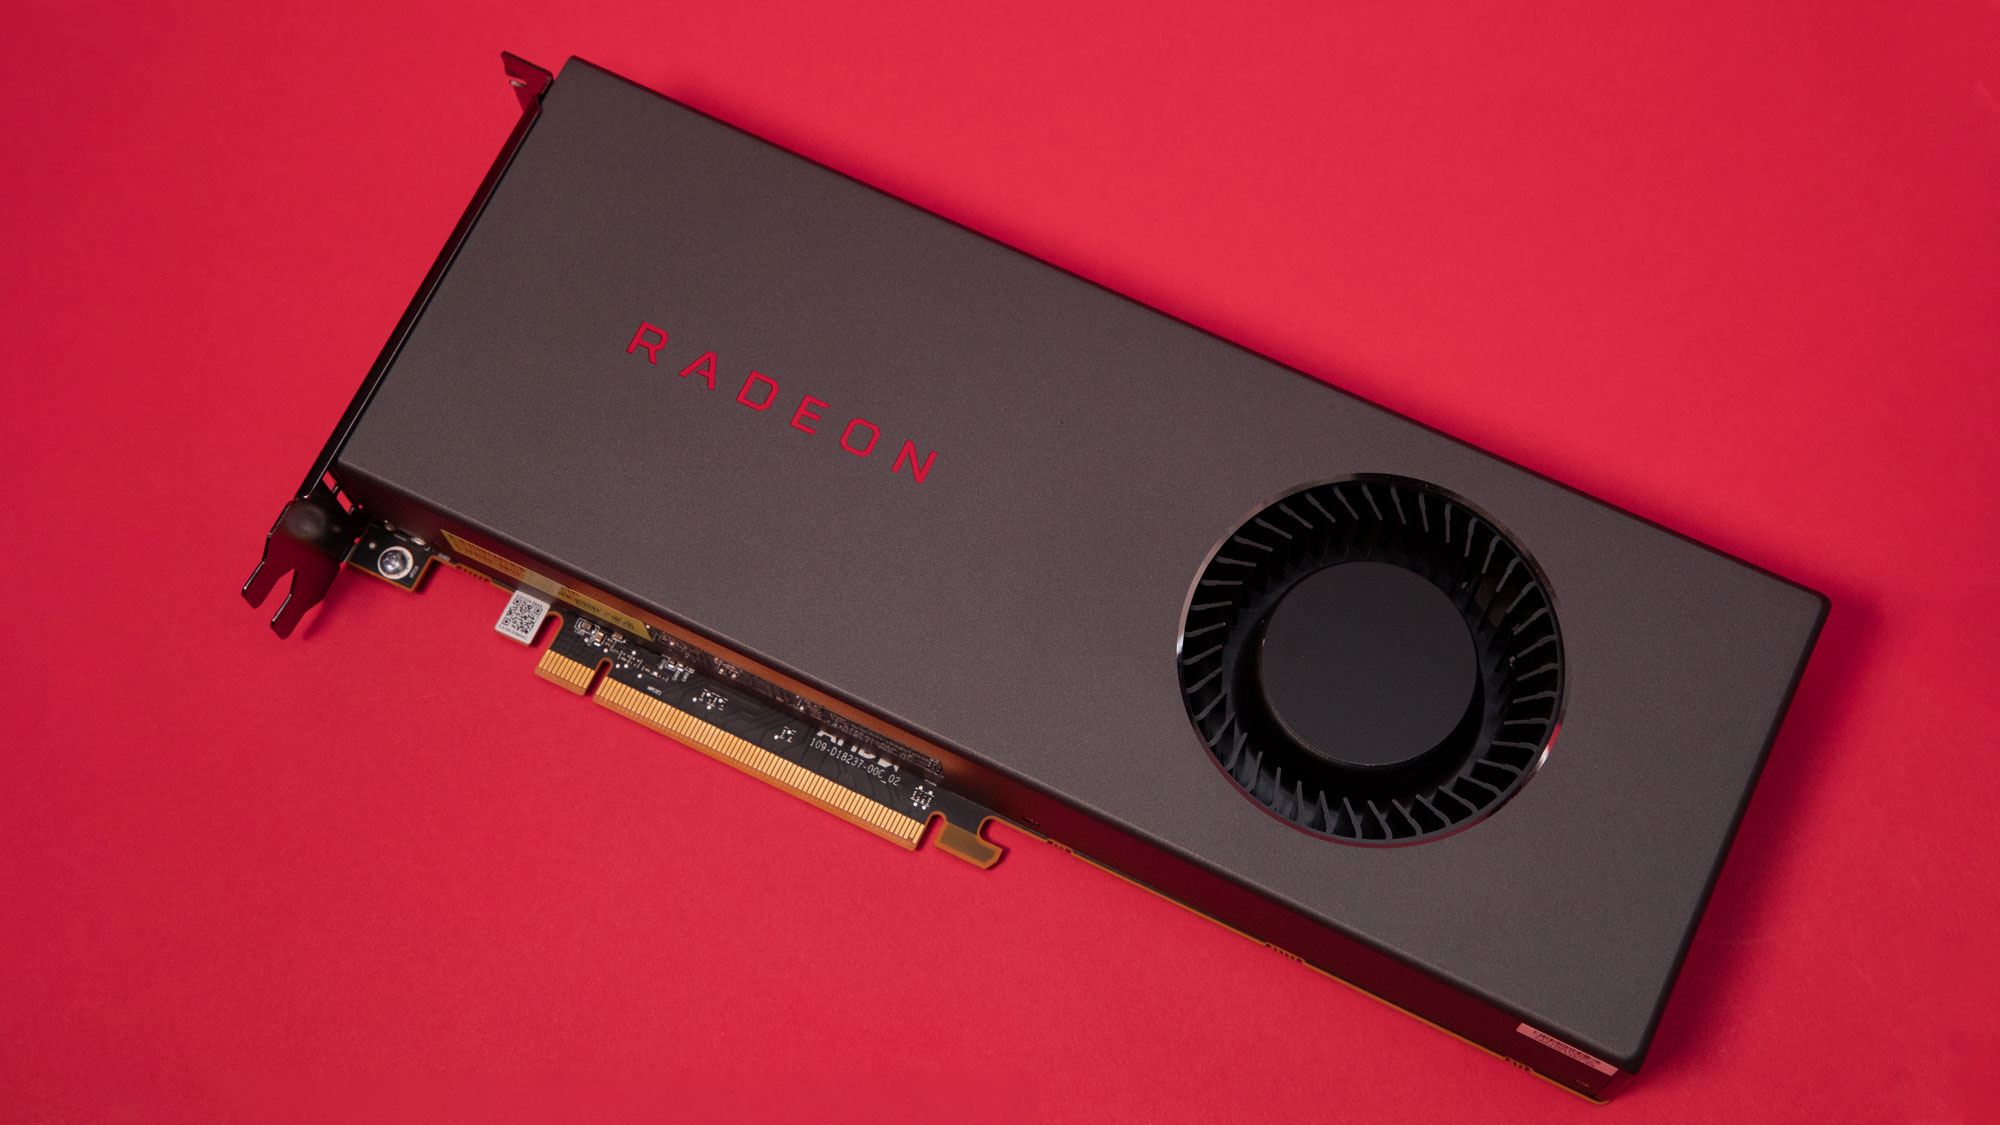 AMD Radeon RX 5700 graphics cards